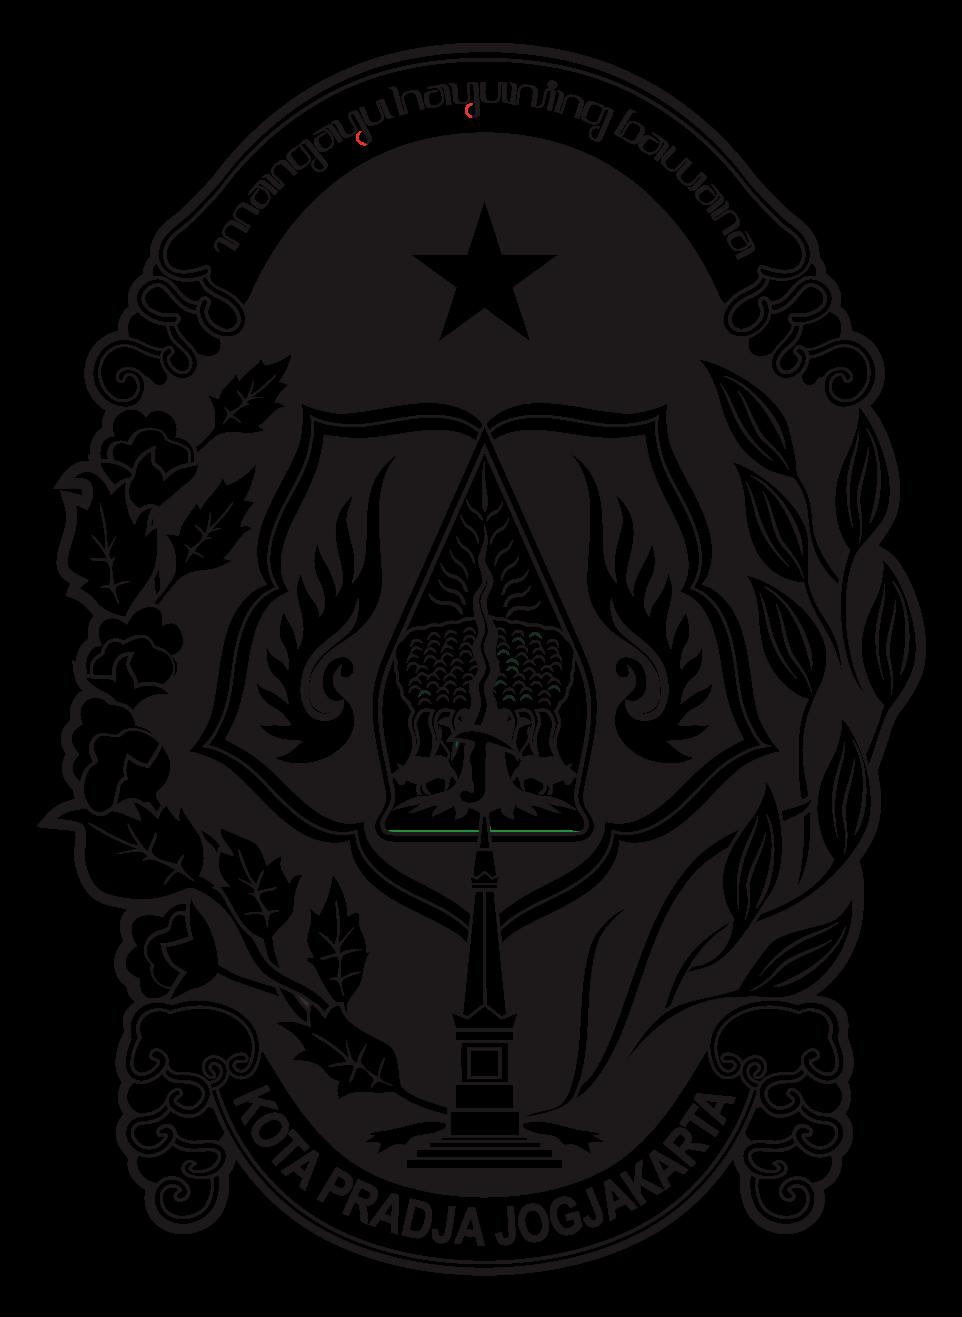 logo kota jogjakarta hitam putih